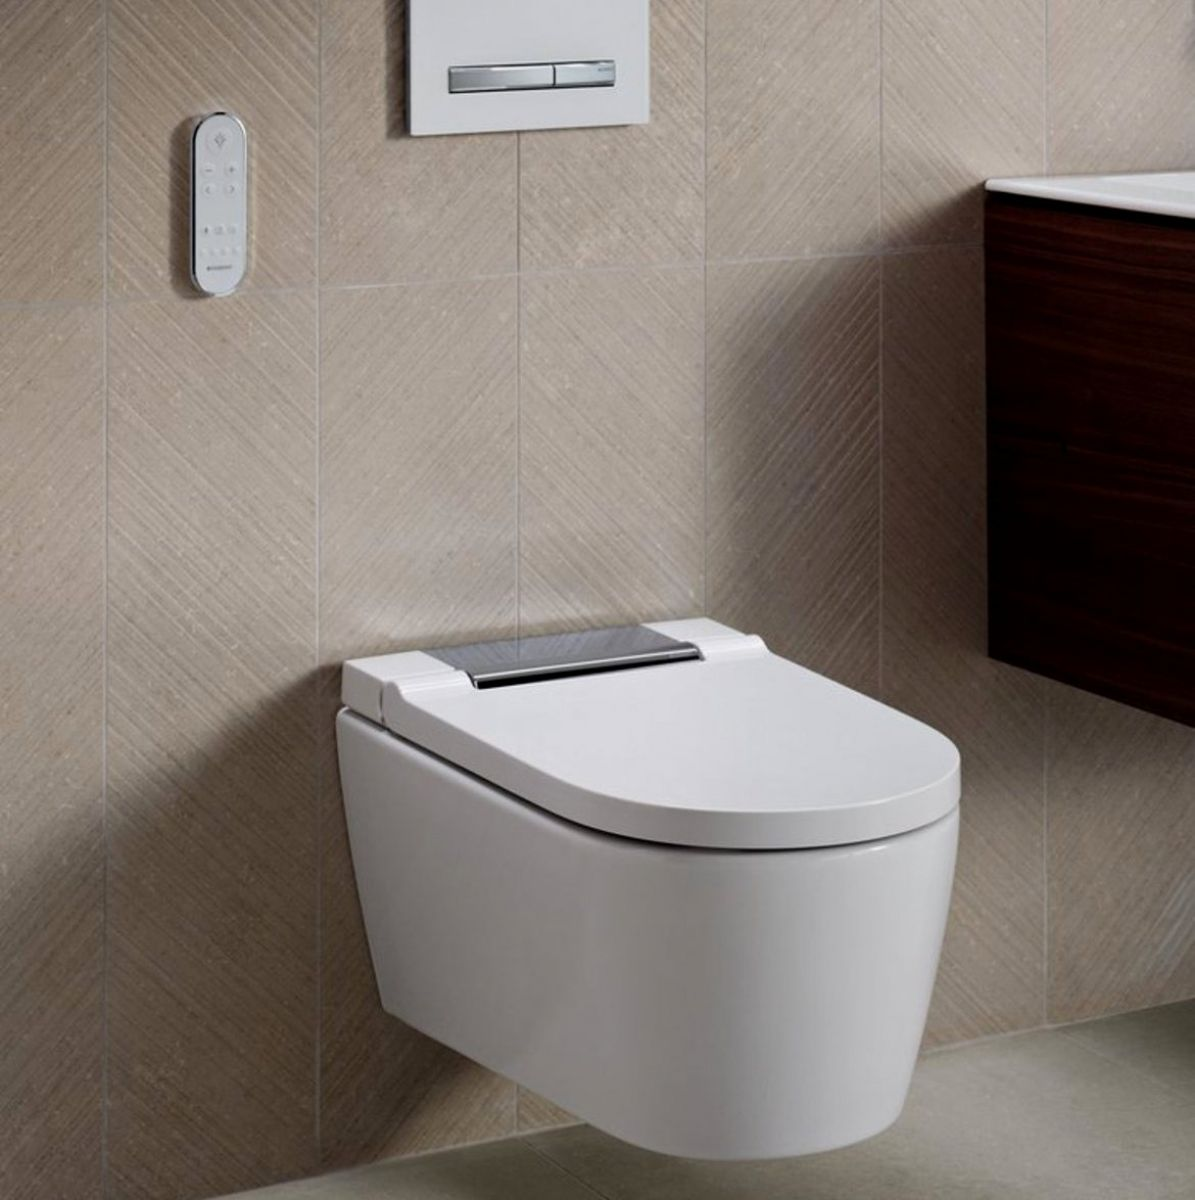 Fine Geberit Aquaclean Sela Wall Hung Shower Toilet Dailytribune Chair Design For Home Dailytribuneorg